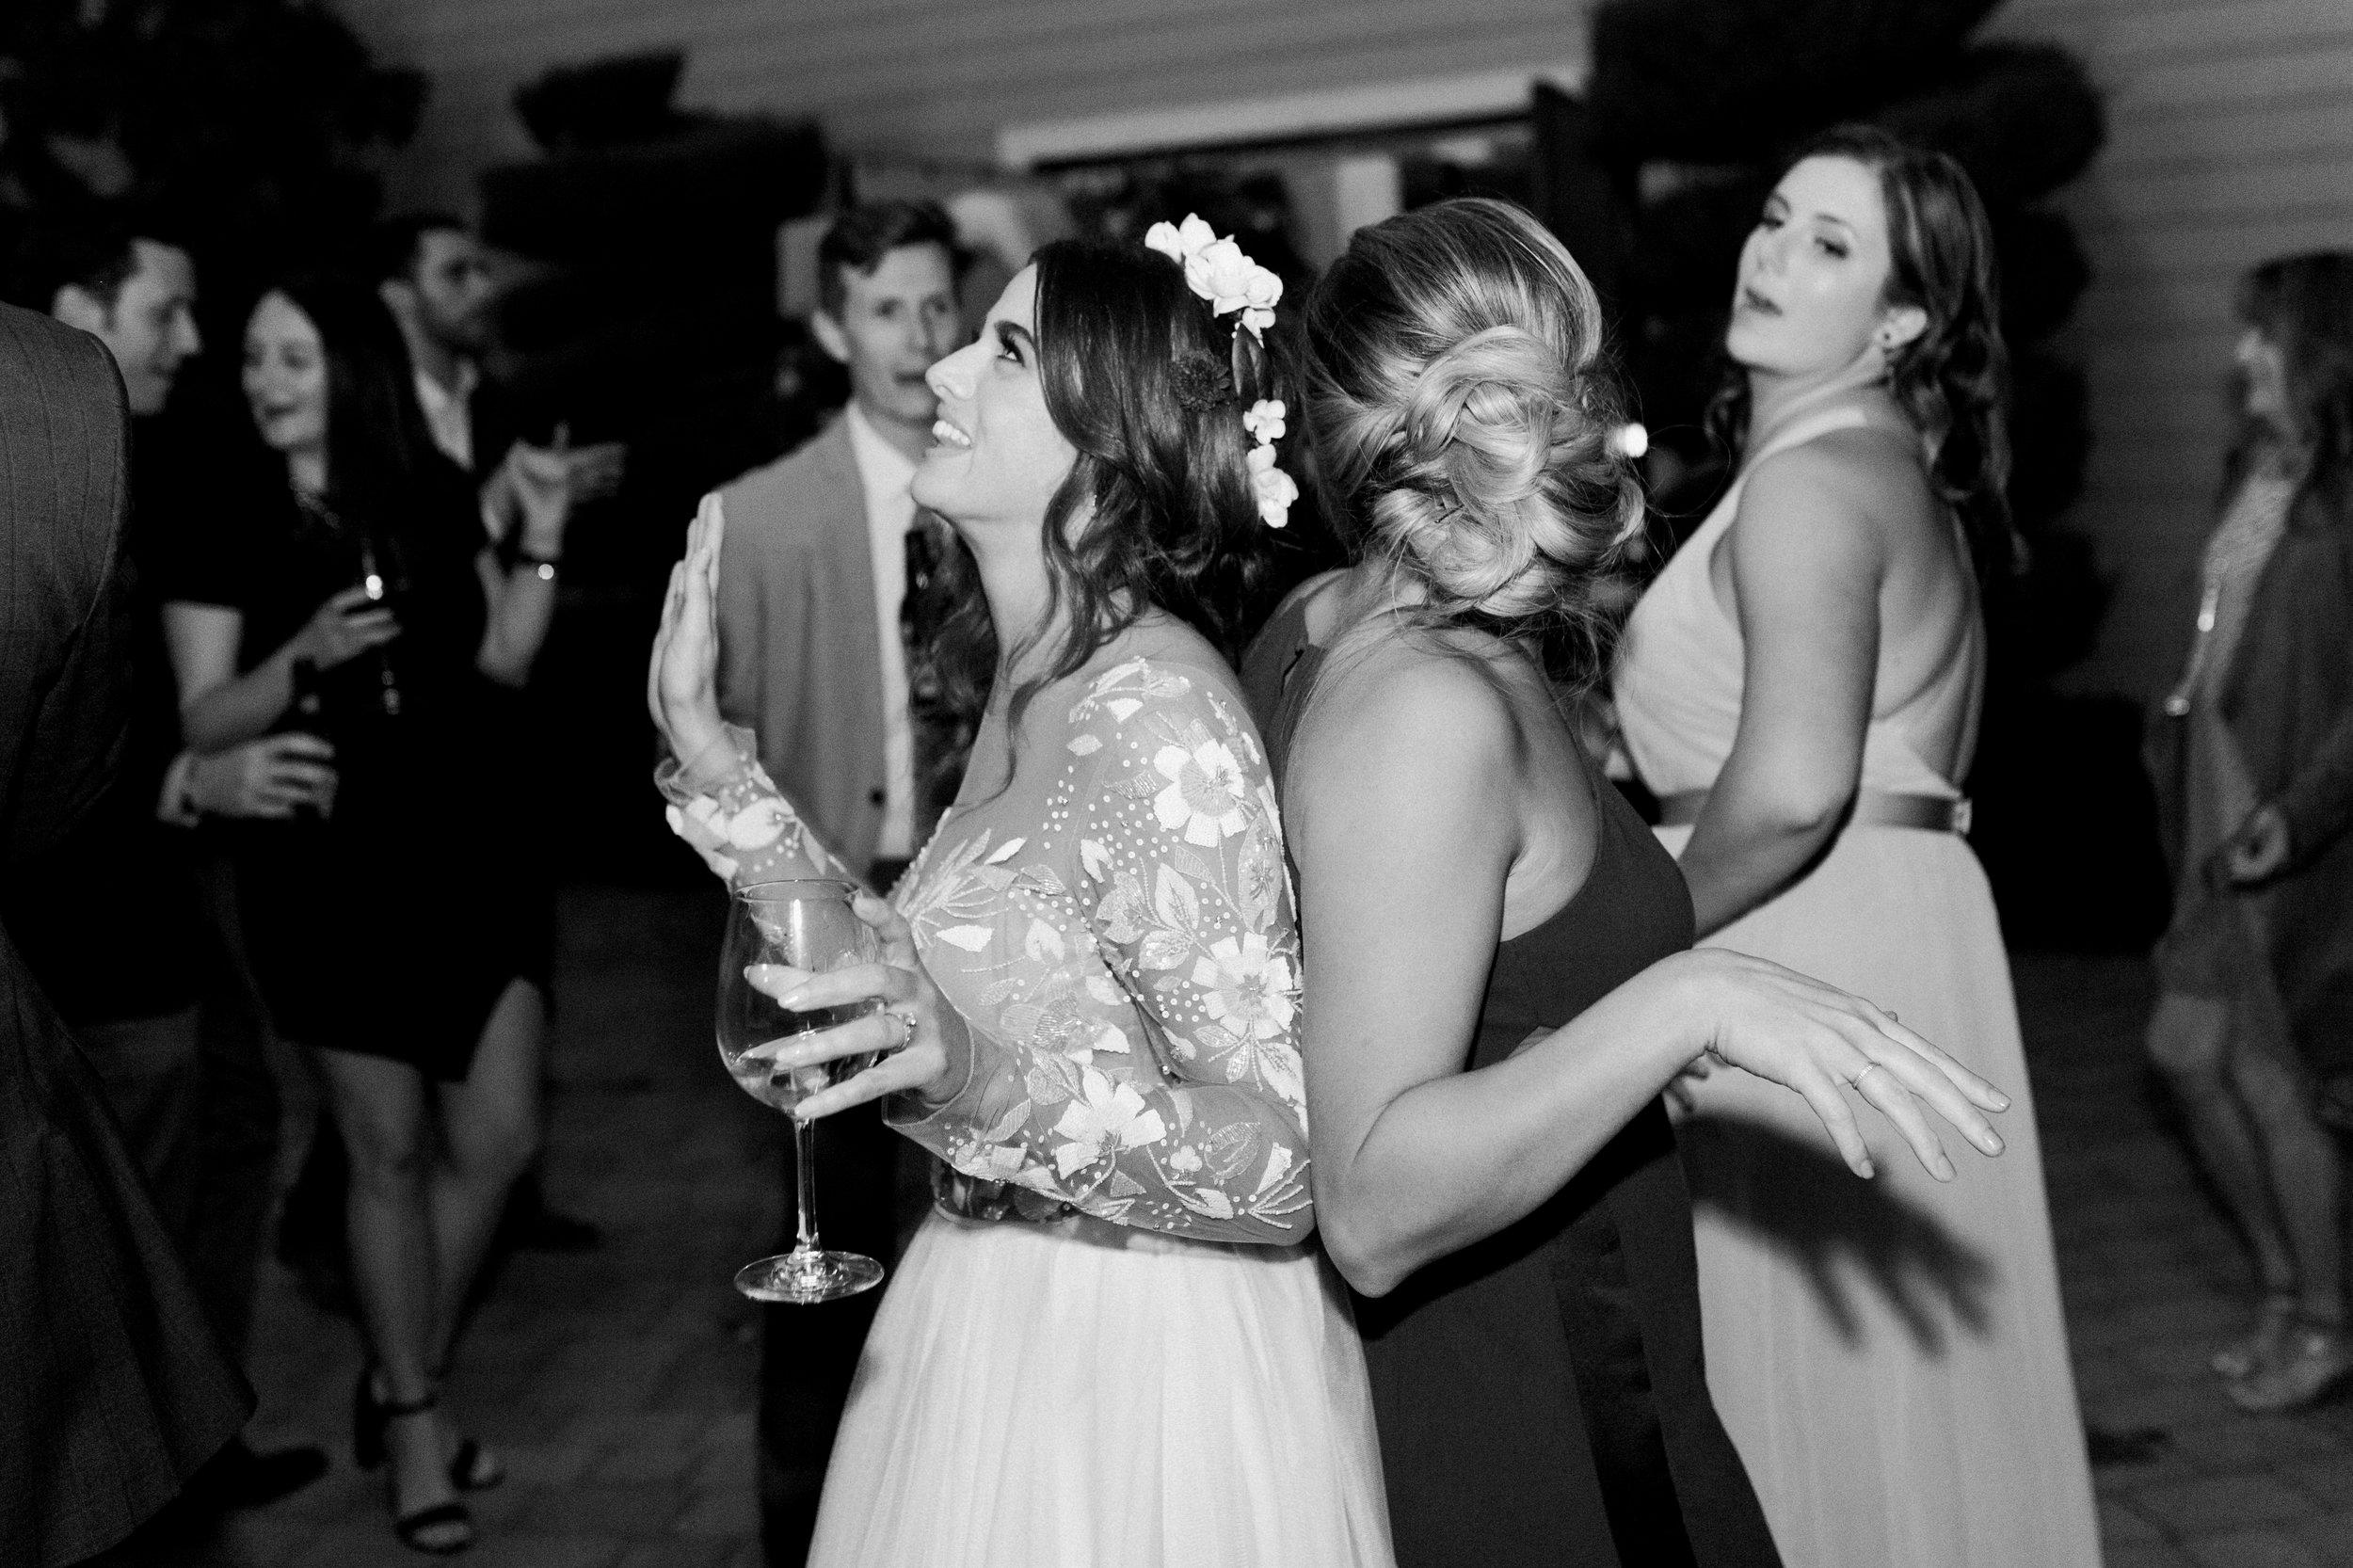 fall-inspired-wedding-at-scribner-bend-vineyards-in-sacramento-california-21.jpg